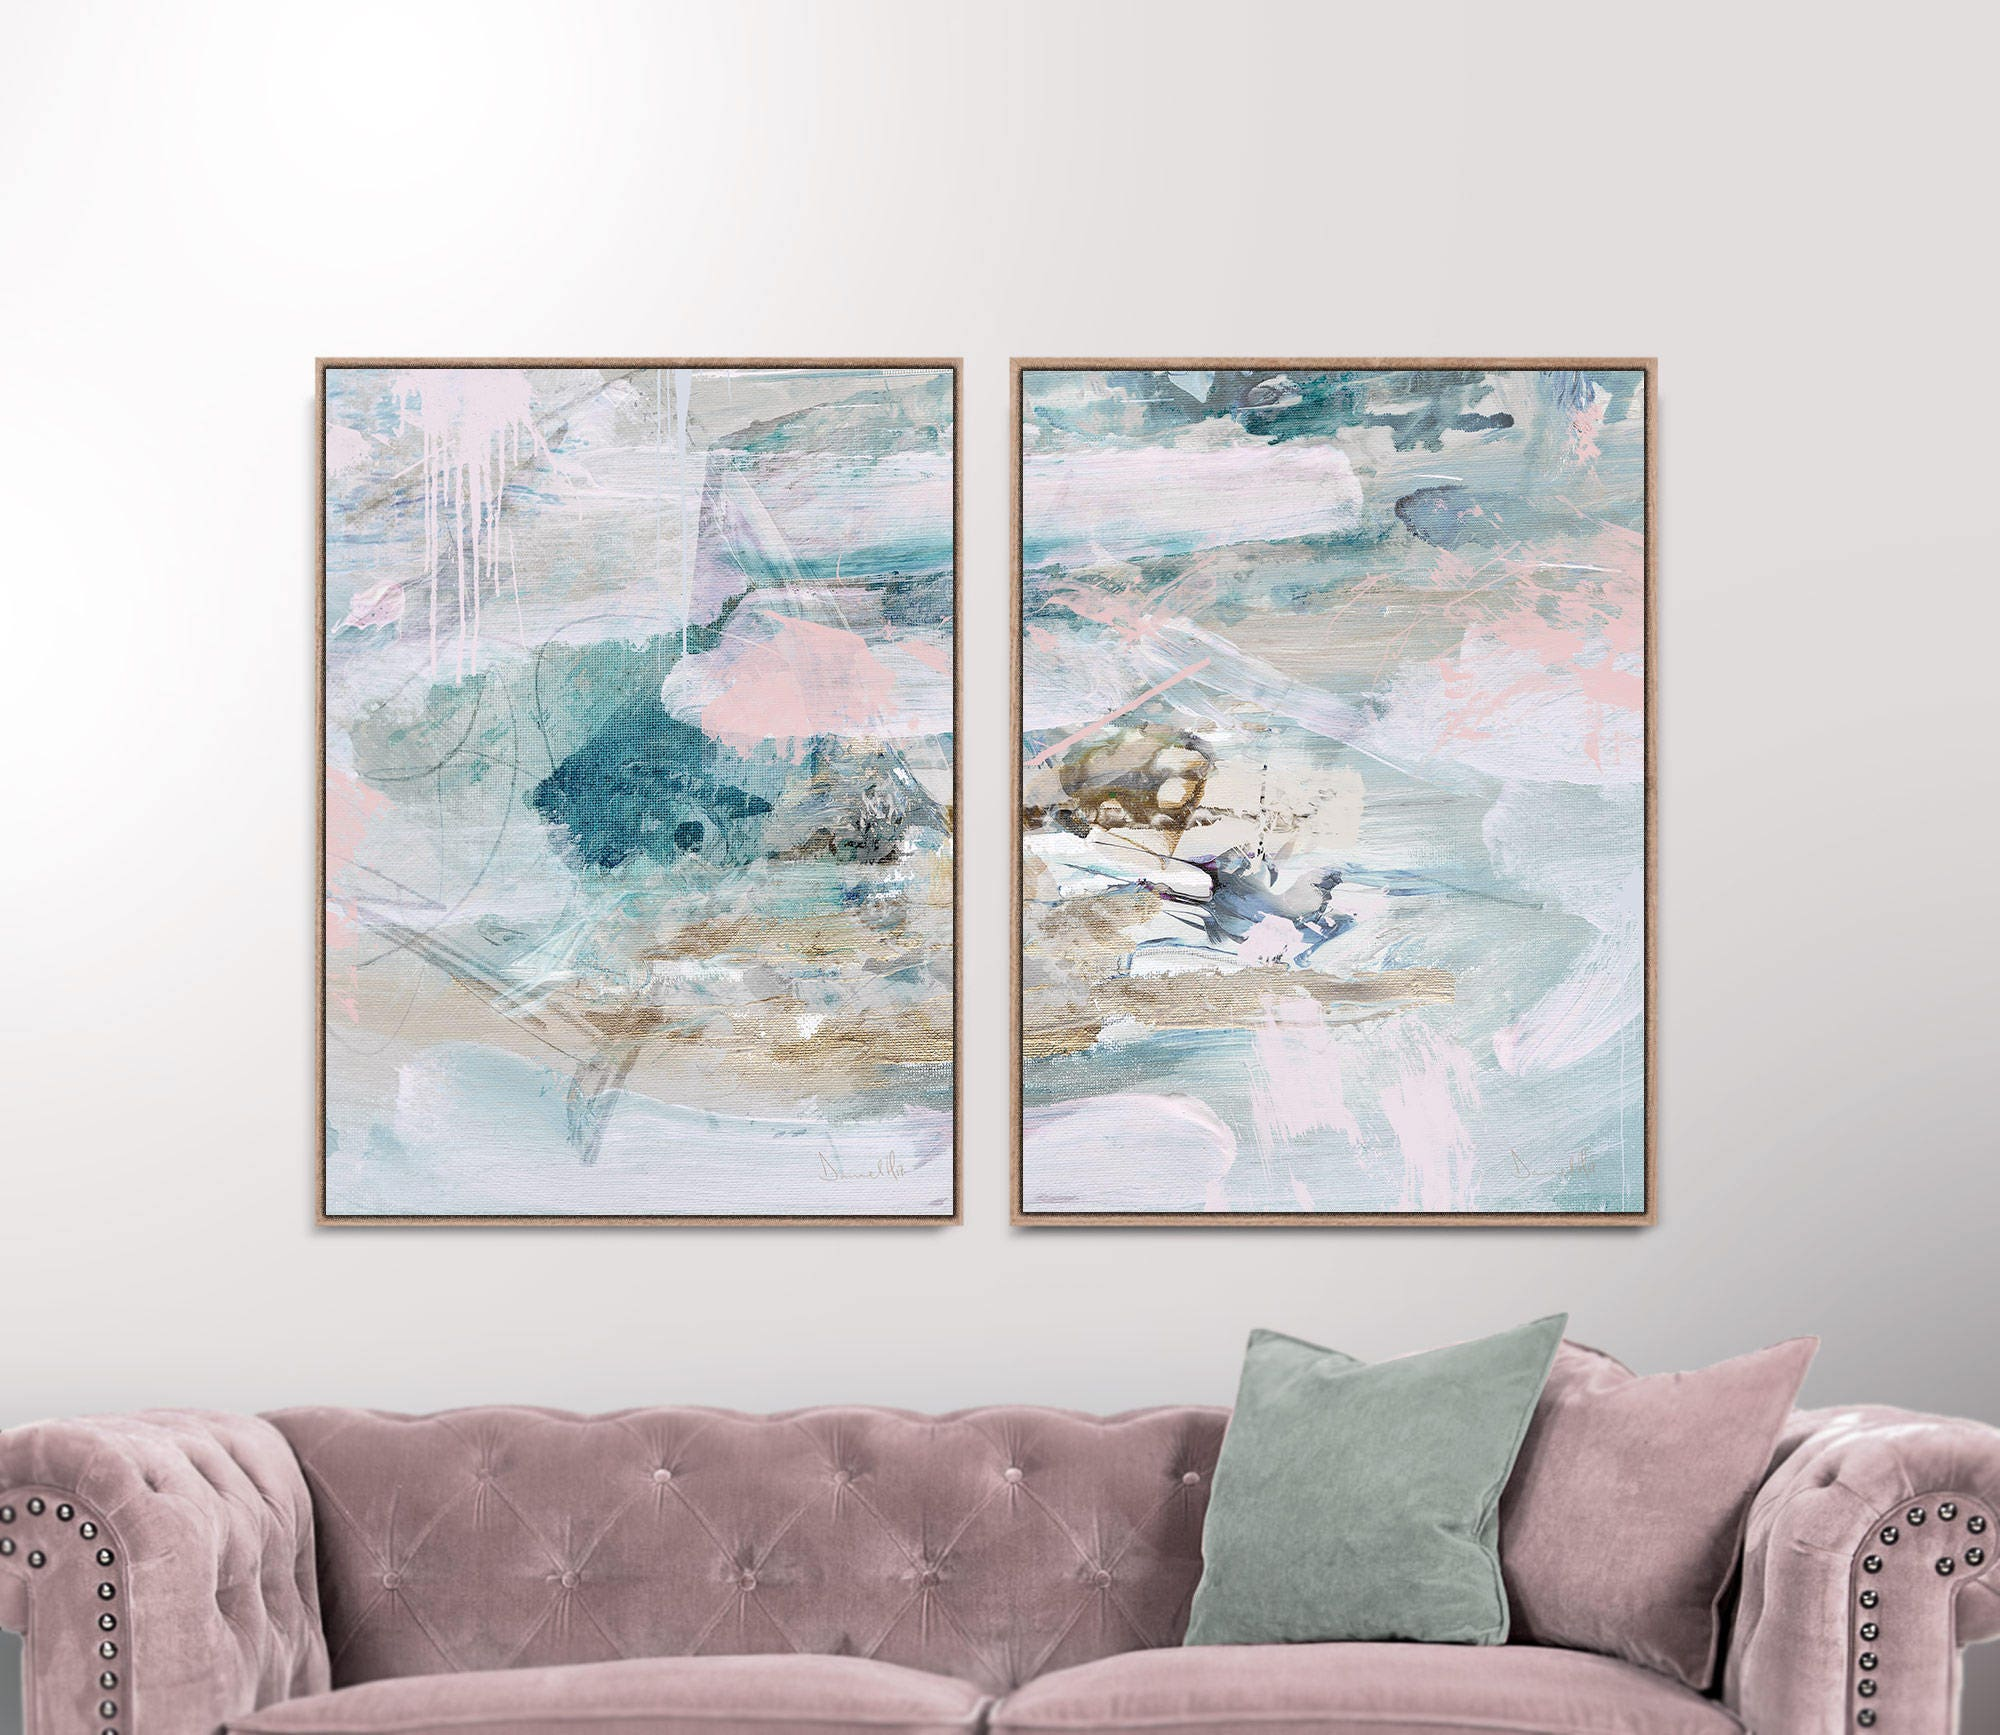 67c41b9485a Set of 2 Prints Abstract Art Prints Large Wall Art 30x40